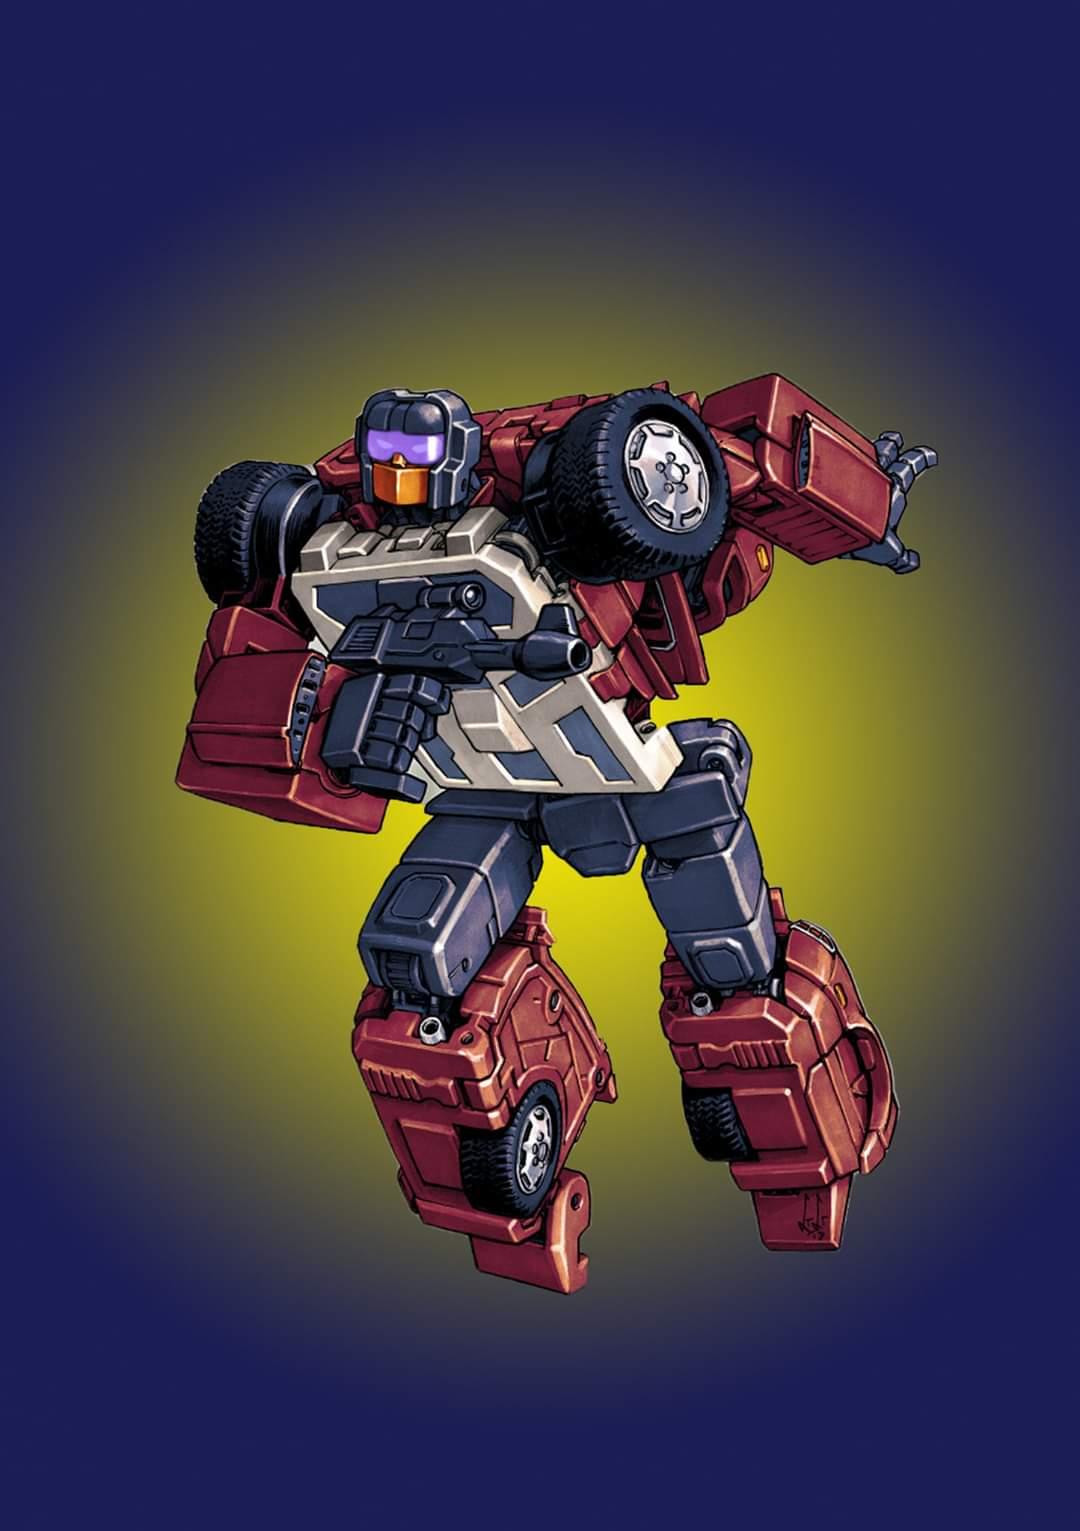 [X-Transbots] Produit Tiers - Jouets Berserkars forme Monolith (MX-XIII à MX-VII) - aka Stunticons forme Menasor/Menaseur - Page 6 H3csBjAp_o